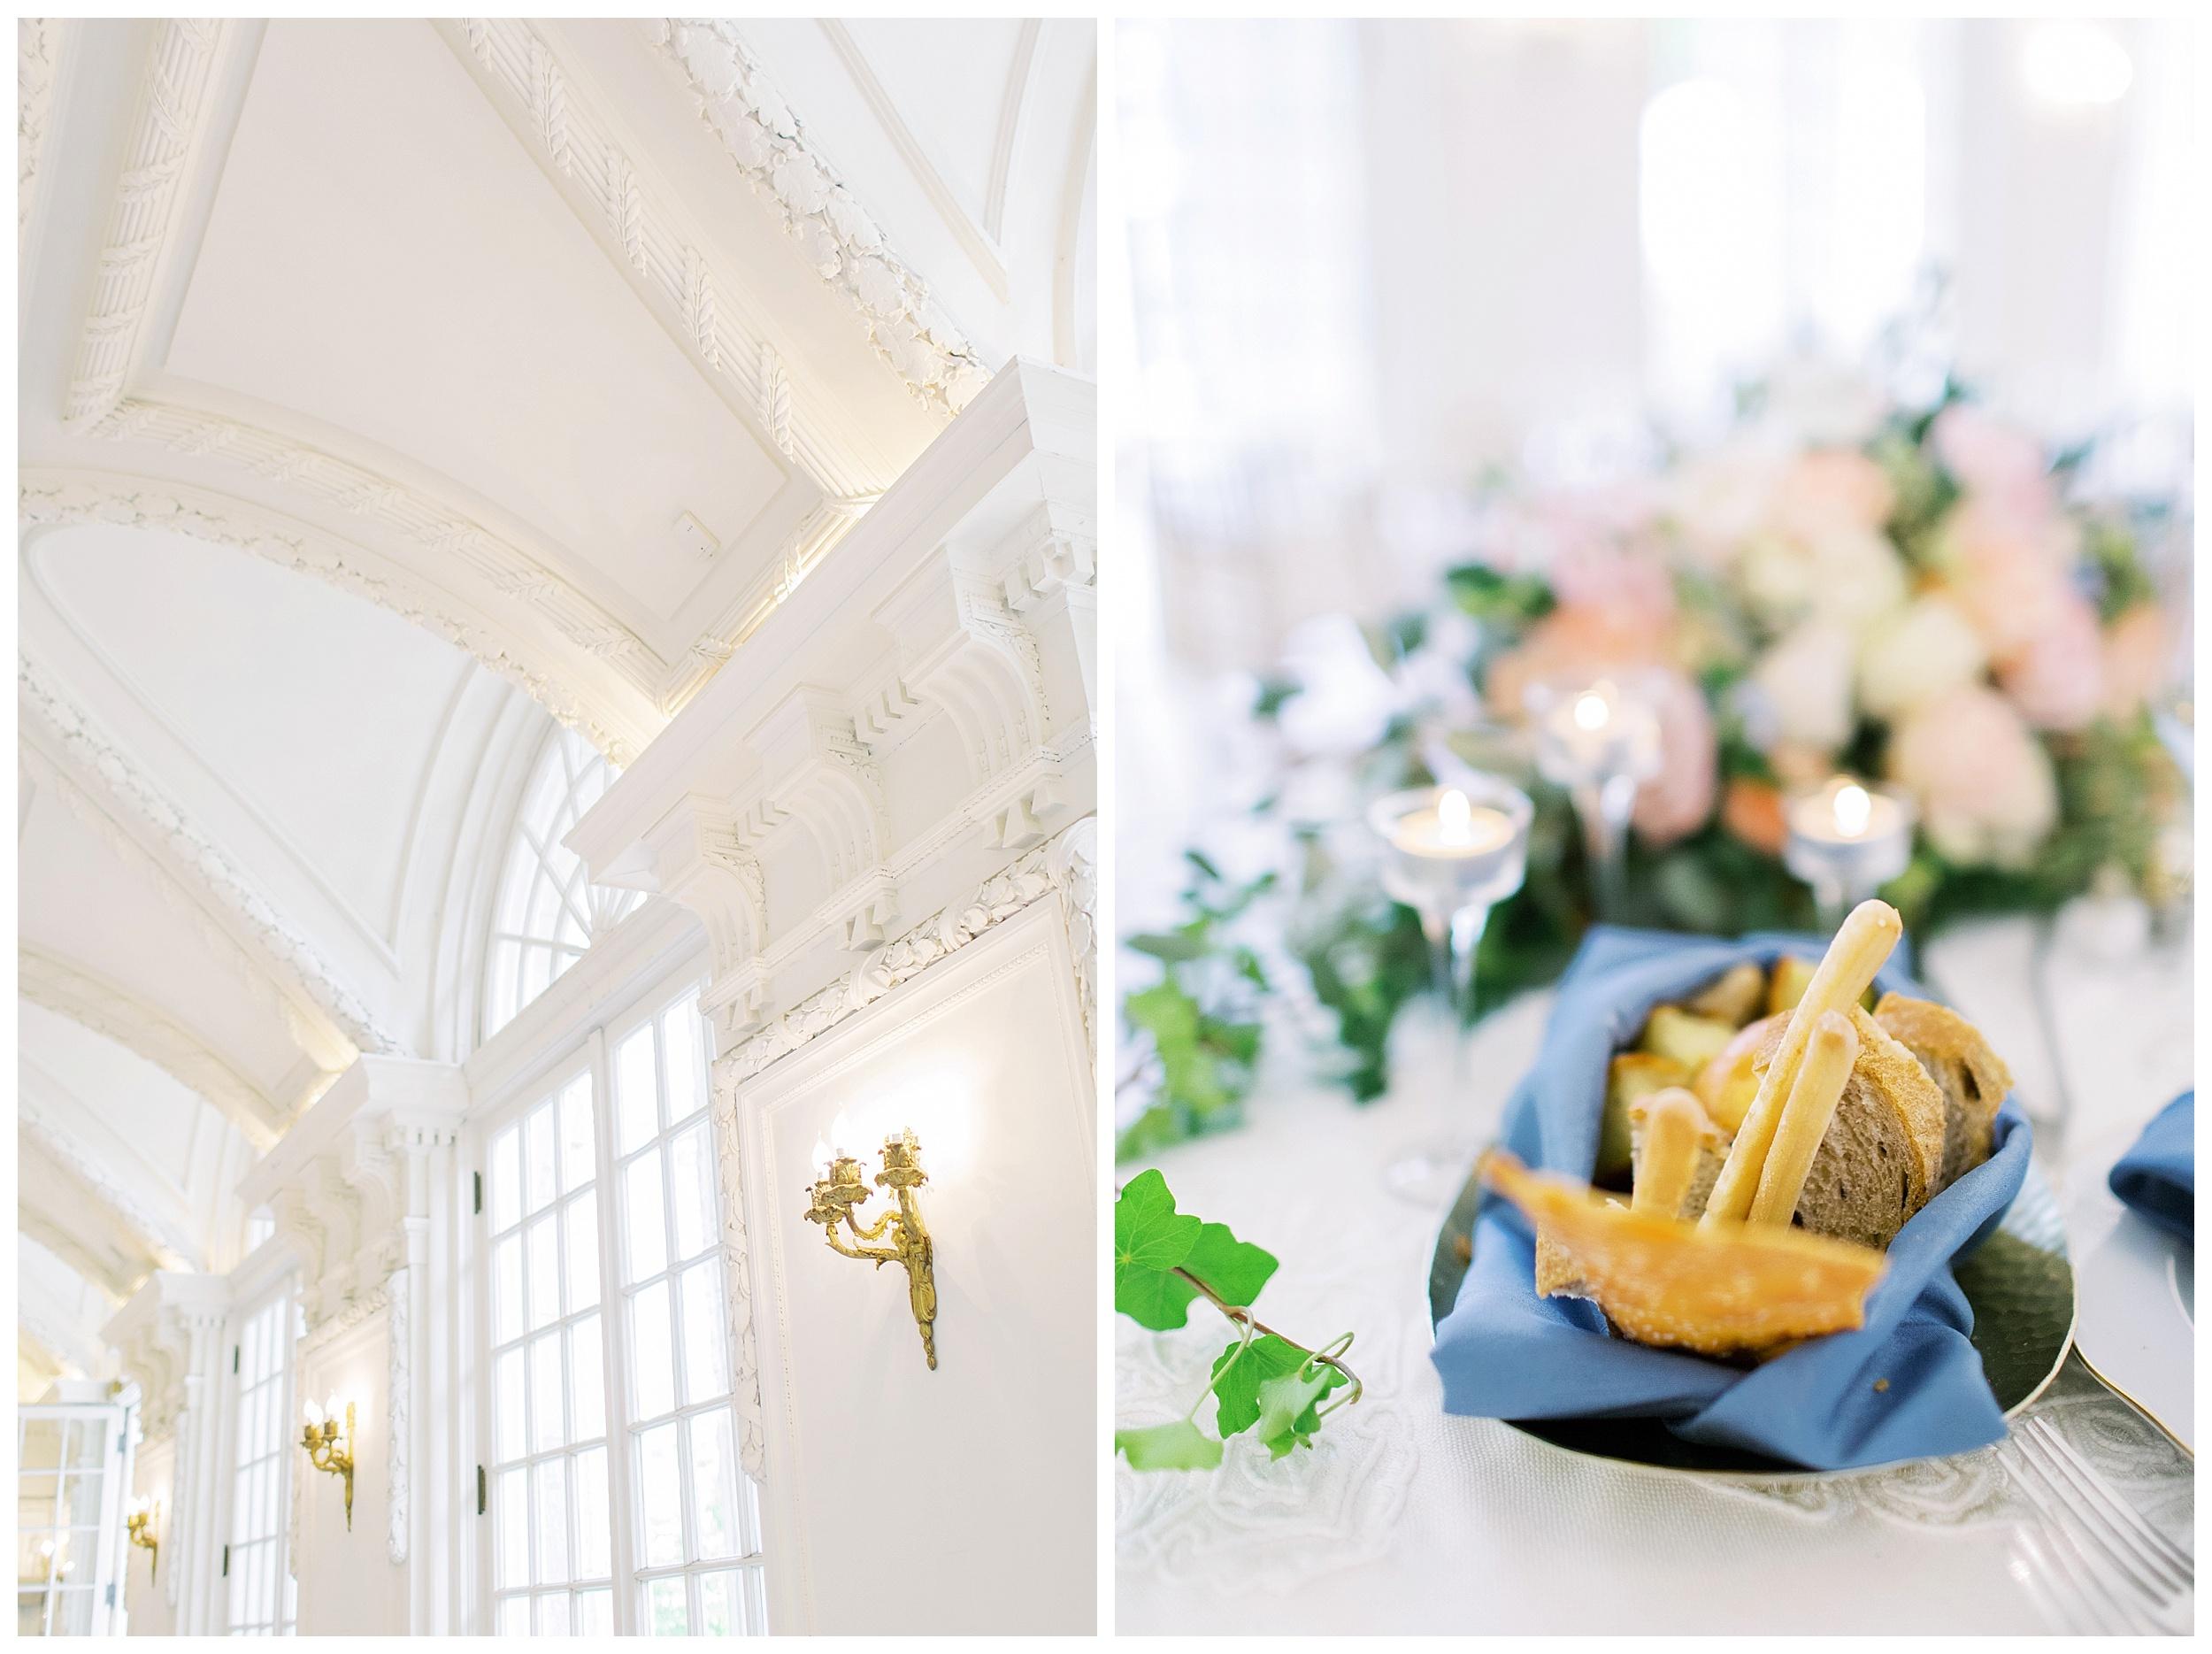 DAR Constitution Hall Wedding Wedding | Daughters of the American Revolution Wedding | District of Columbia Film Wedding Photographer Kir Tuben_0127.jpg